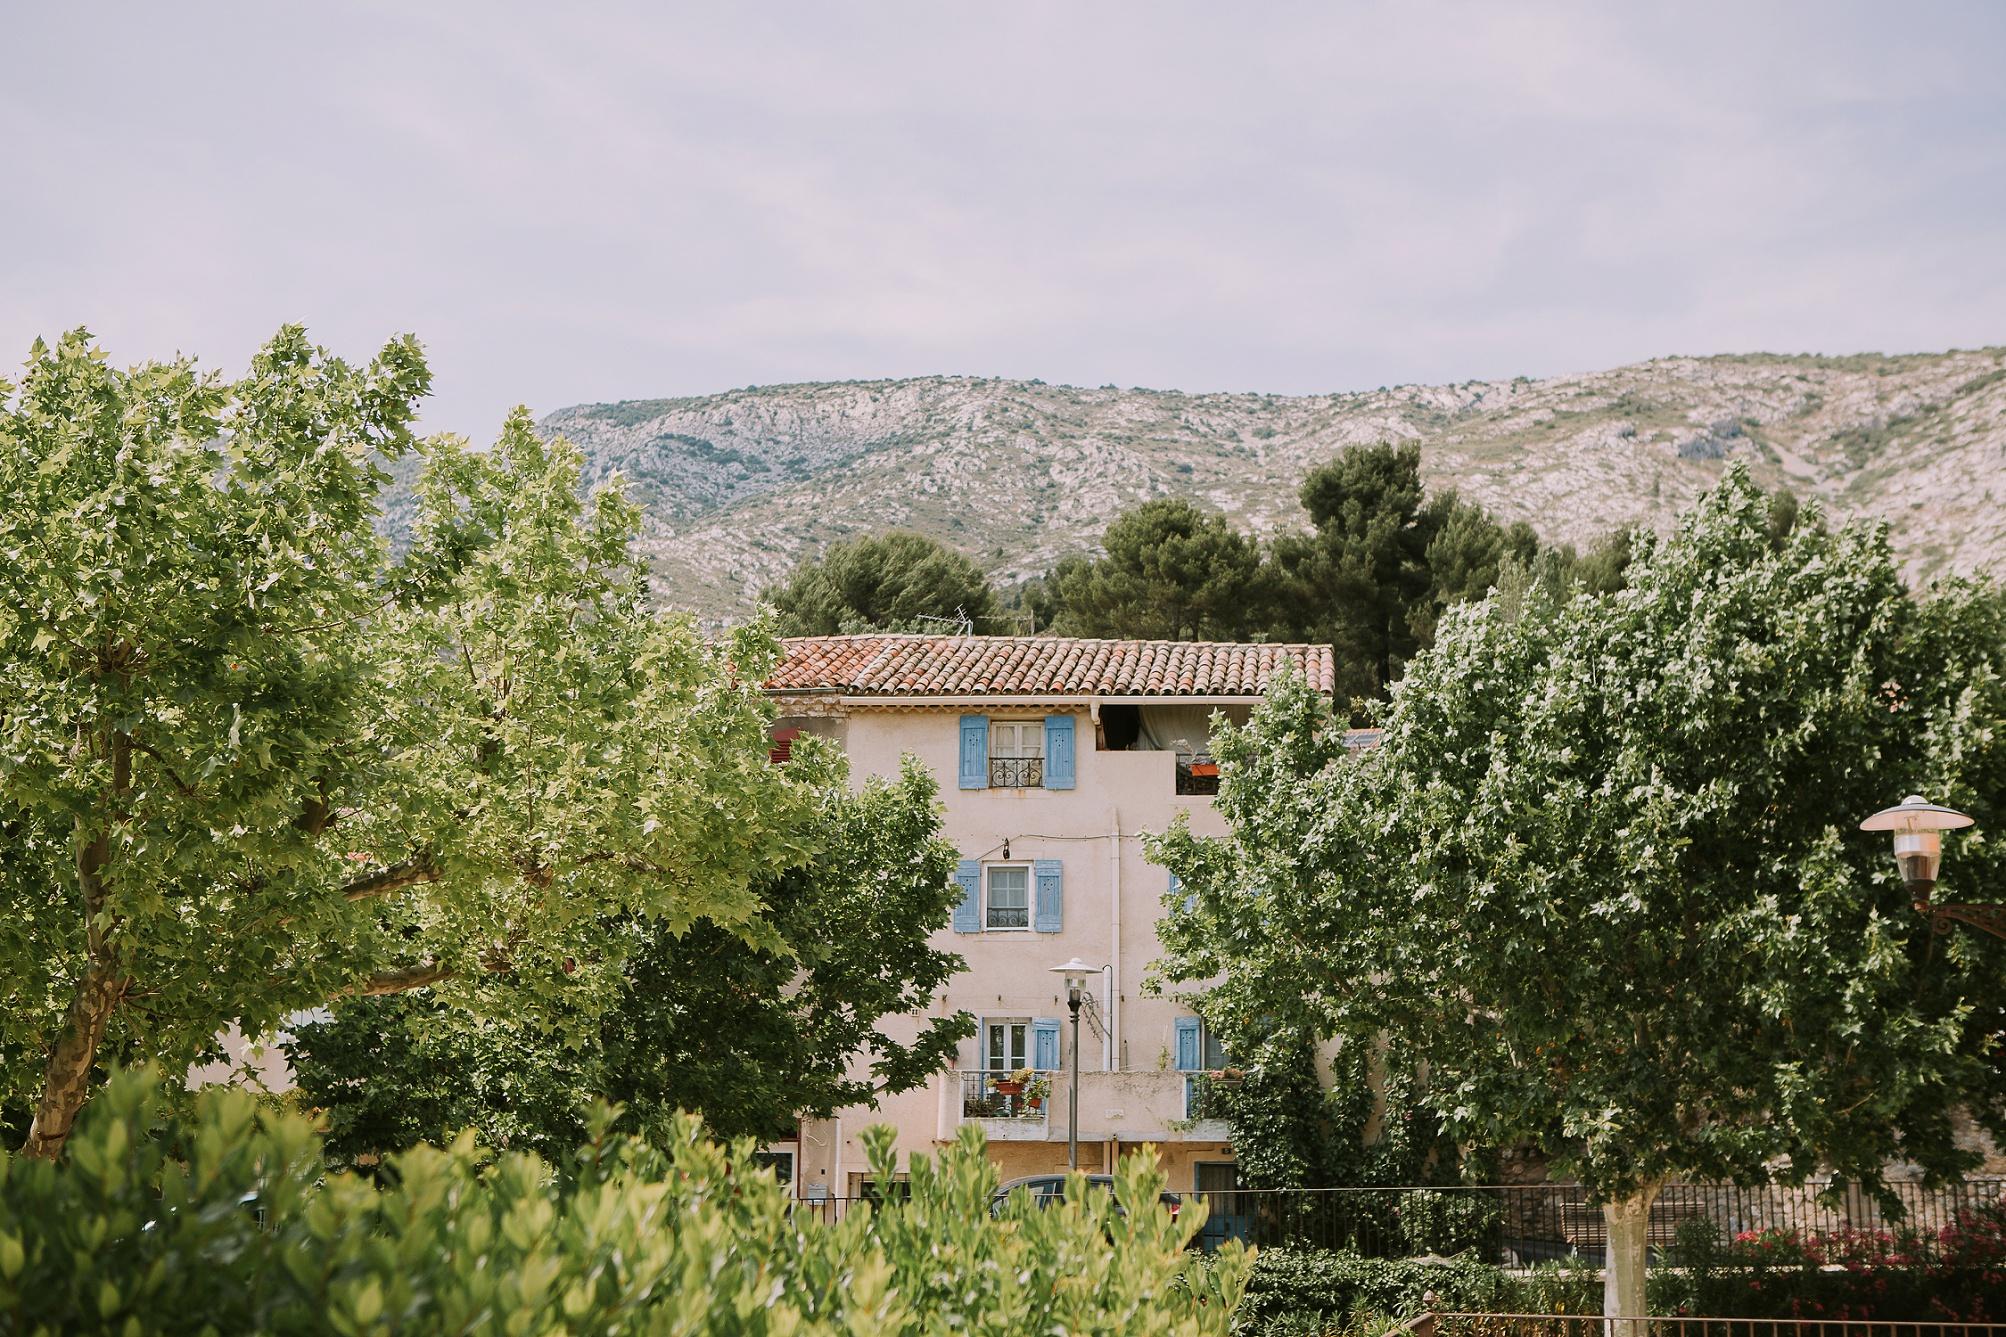 katerynaphotos-mariage-photographe-puyloubier-provence-aix-en-provence-sud-de-la-france_0354.jpg